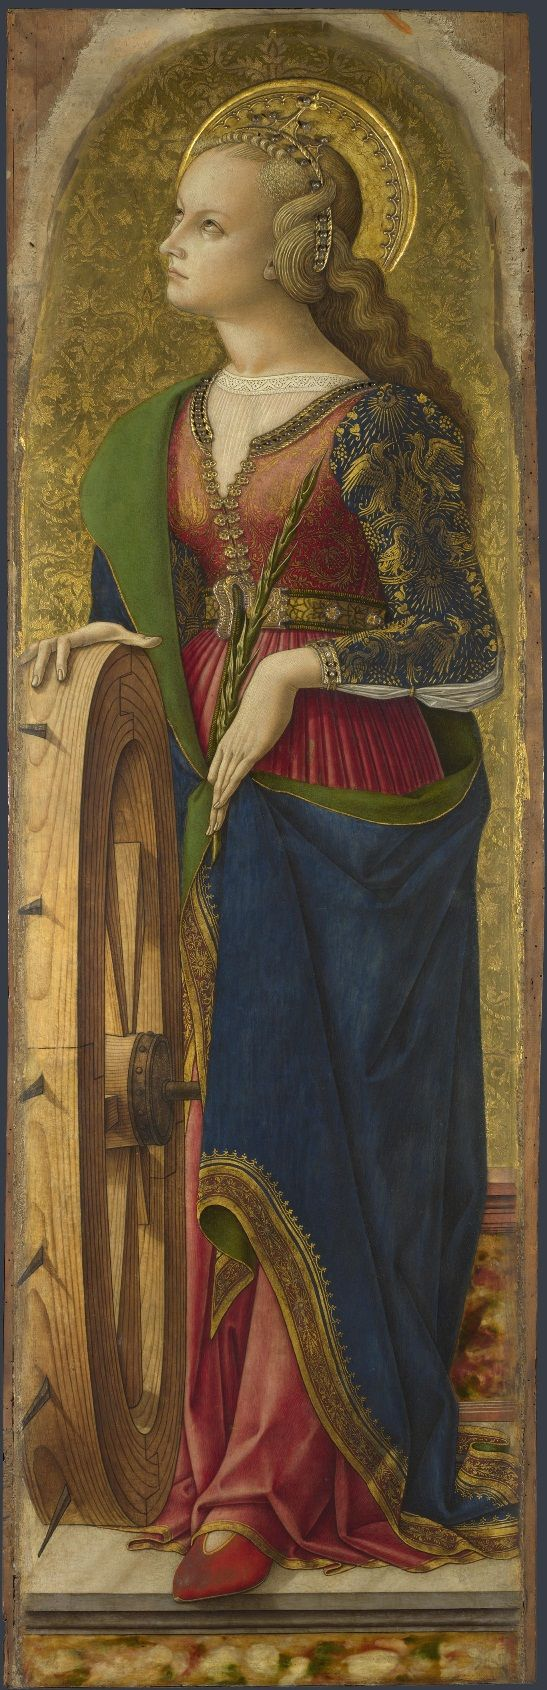 Carlo Crivelli (1435 – 1495) | Polyptych of San Domenico. Saint Catherine of Alexandria (detail). National Gallery, London.